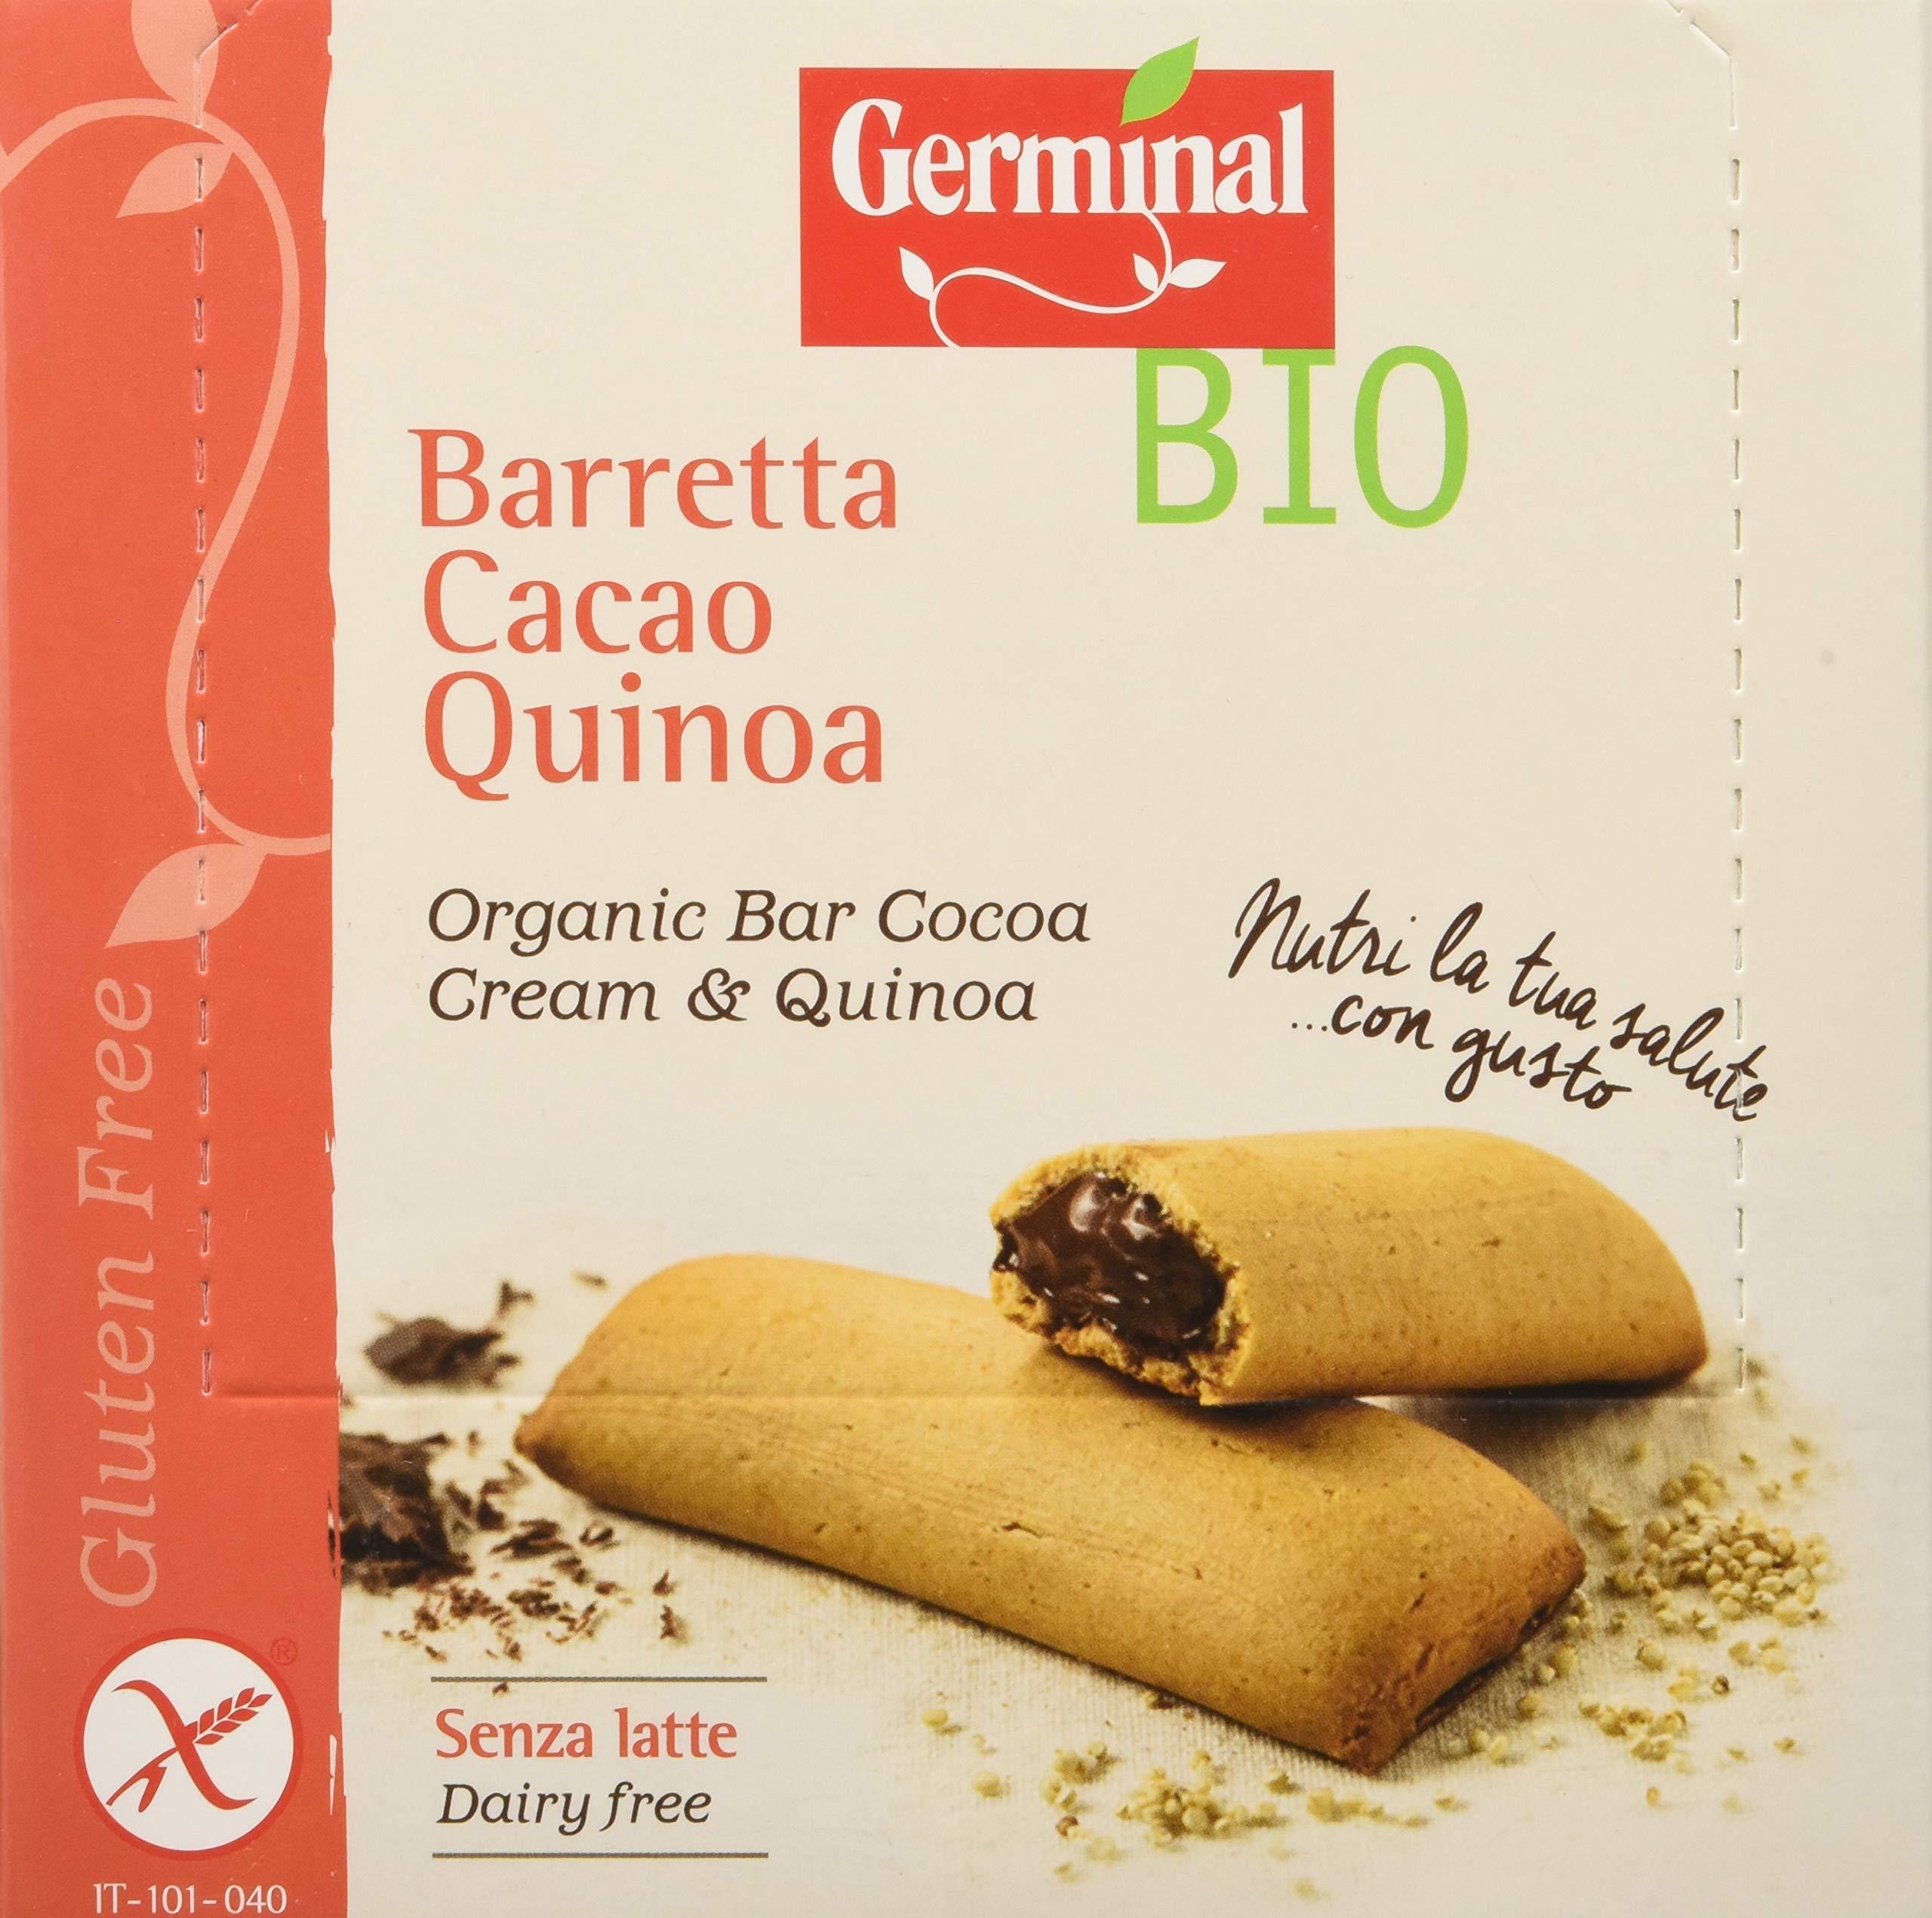 Germinal Bio Barretta Cacao Quinoa - 1800 gr, Senza glutine 1 spesavip